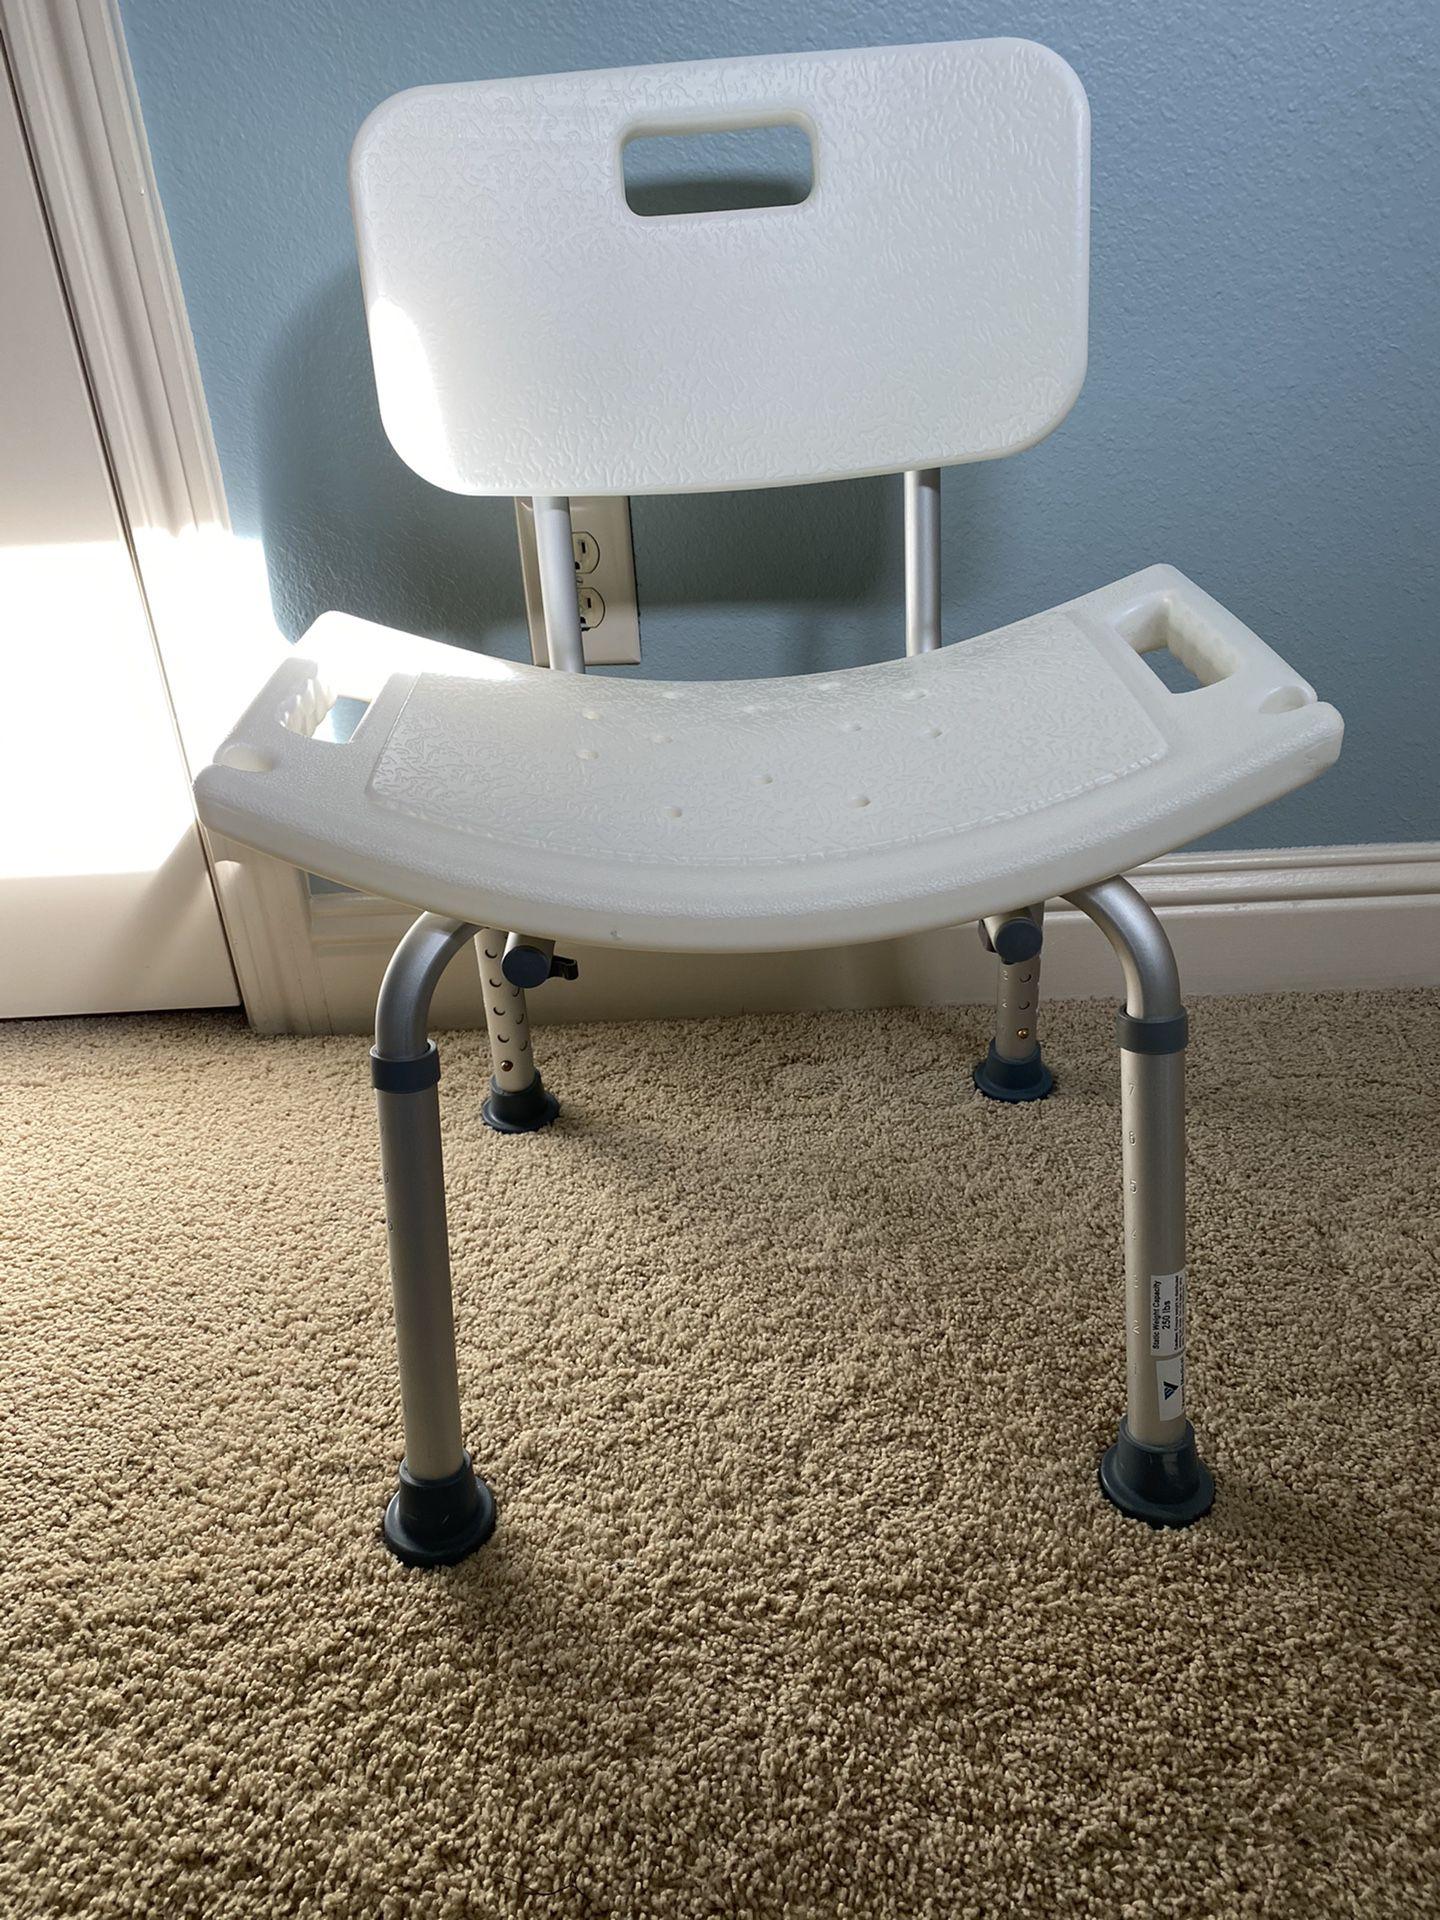 shower Chair